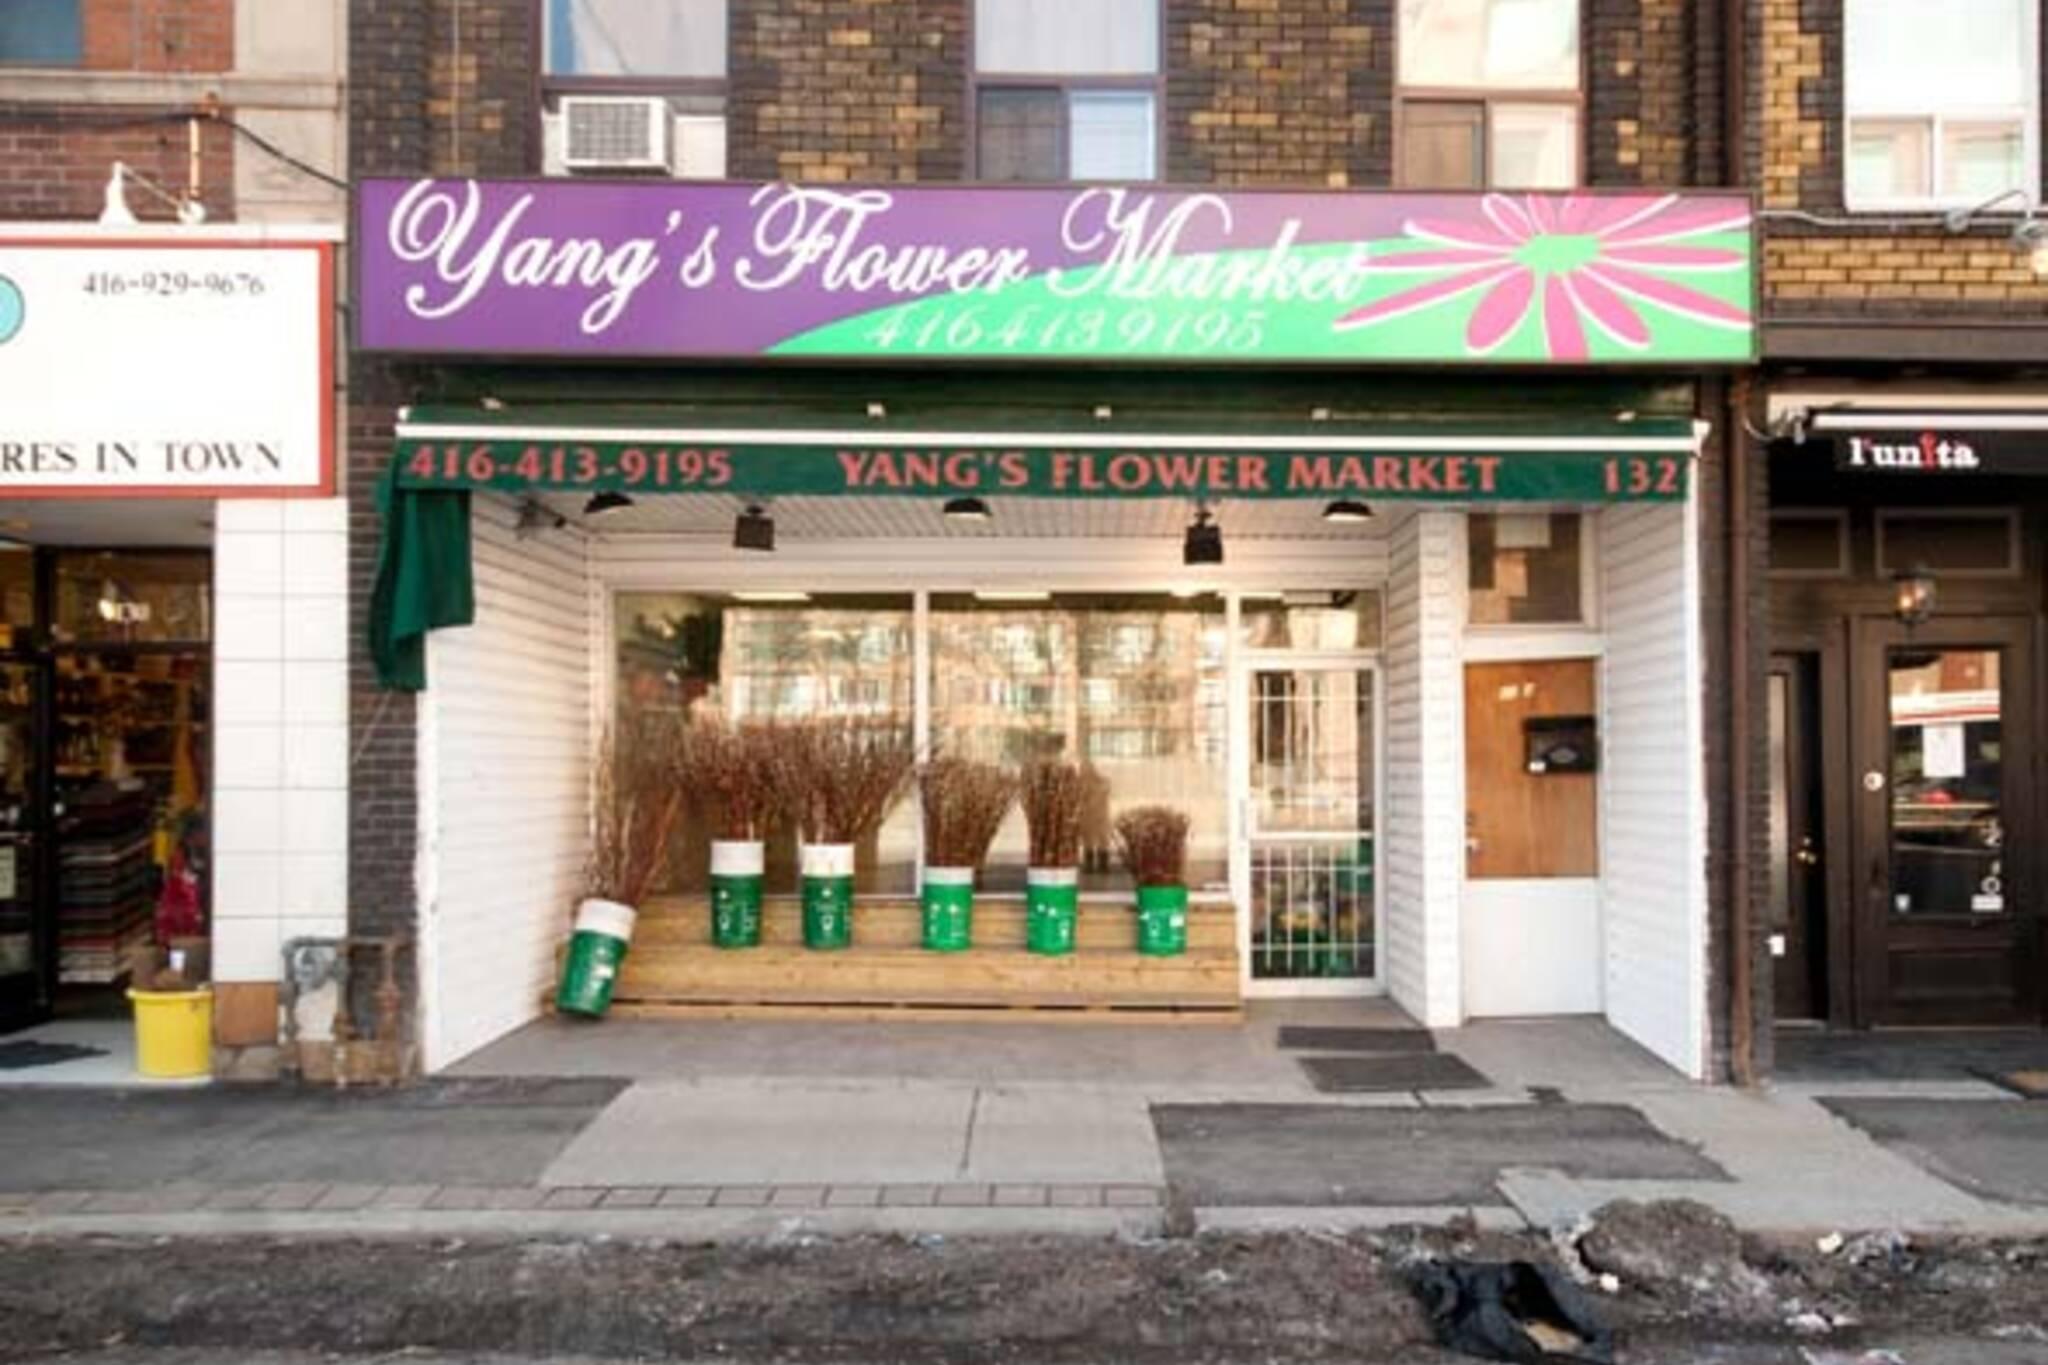 Yang's Flower Market